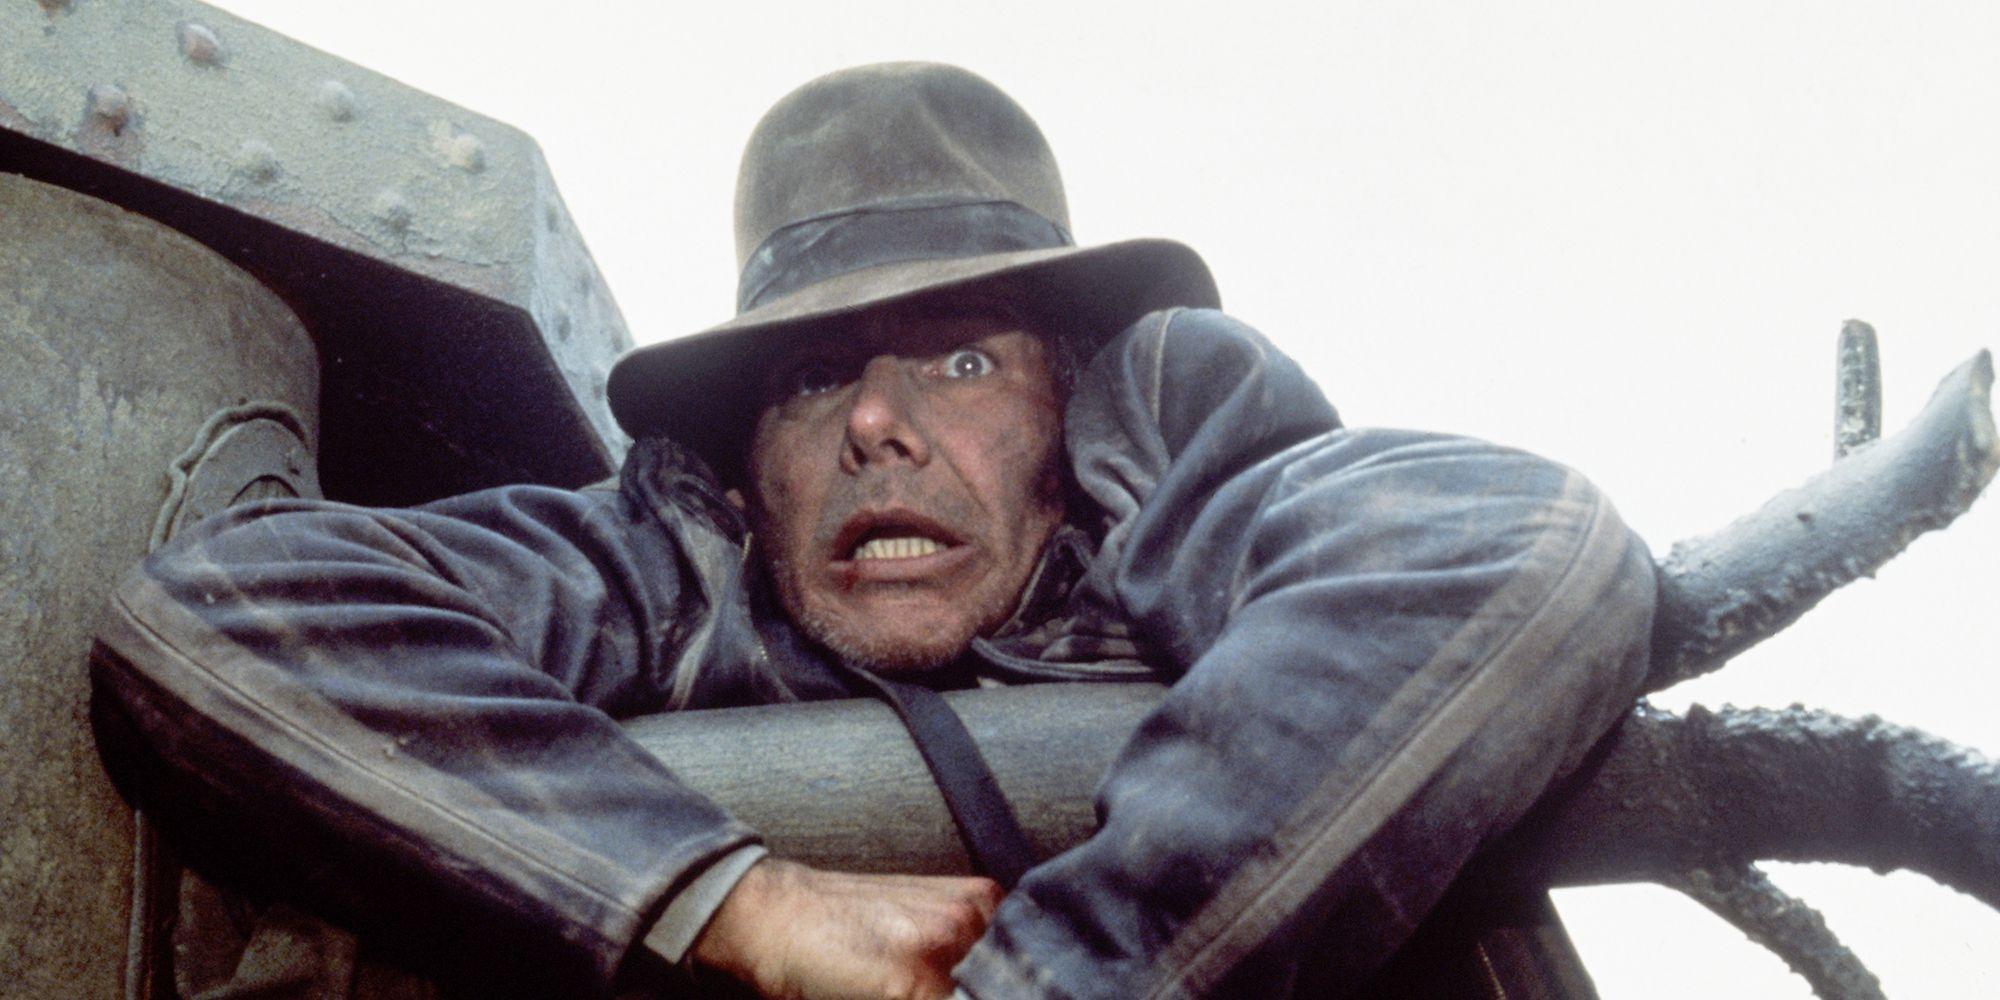 eeb0043f8e7 Indiana Jones 5 cast